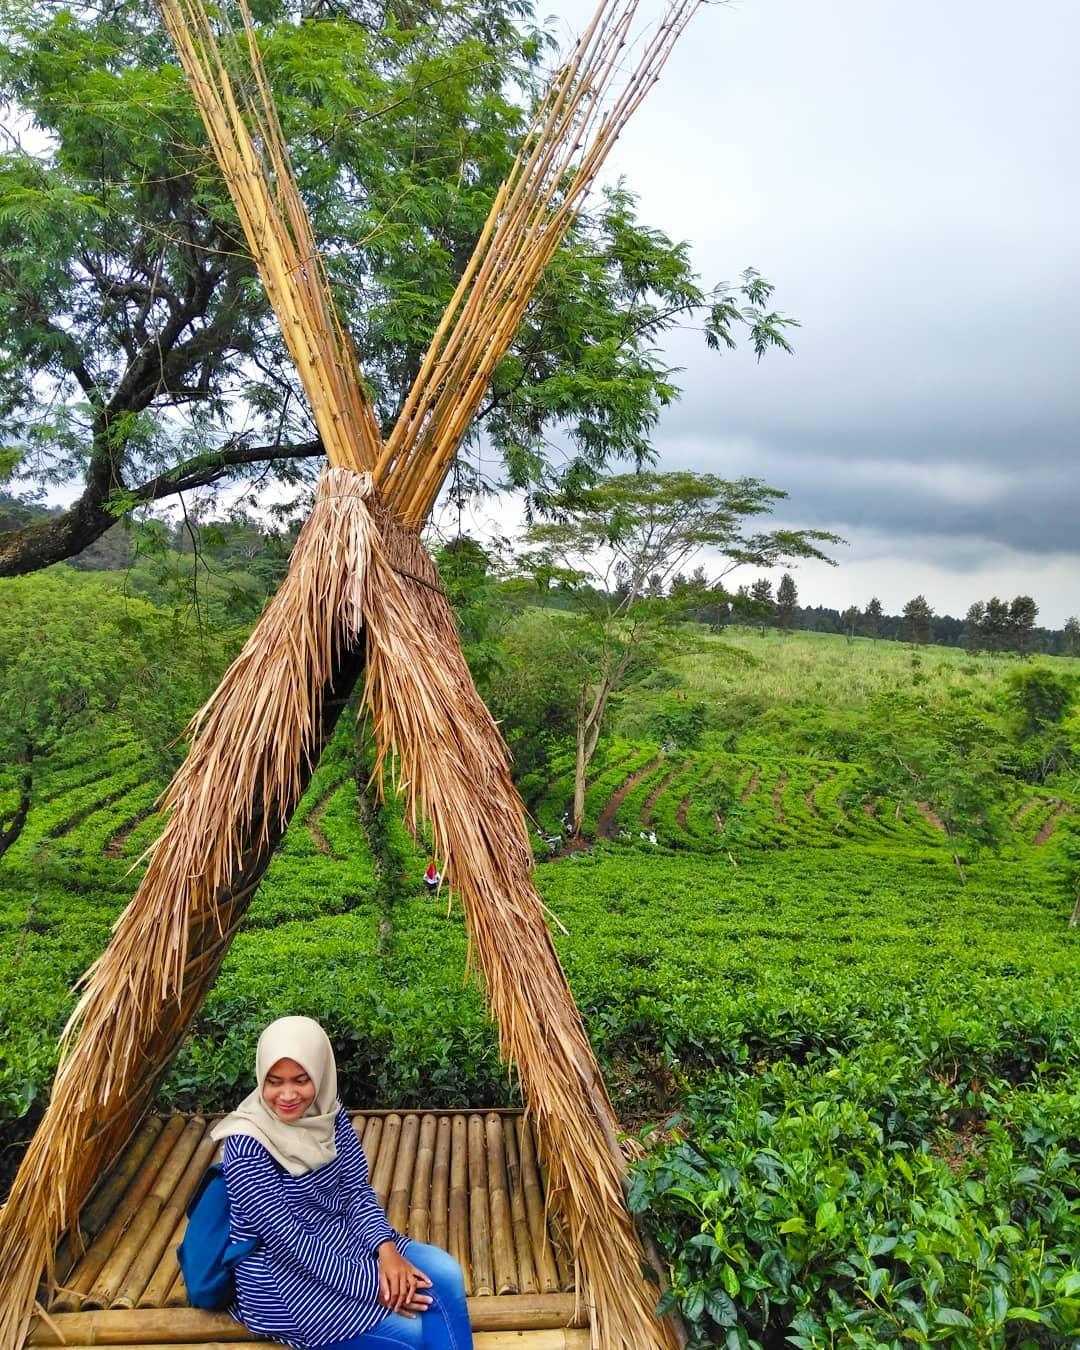 Wisata Zaman Now, Malang, Kabupaten Malang, Dolan Dolen, Dolaners Wisata Zaman Now via lailatul fitria27 - Dolan Dolen